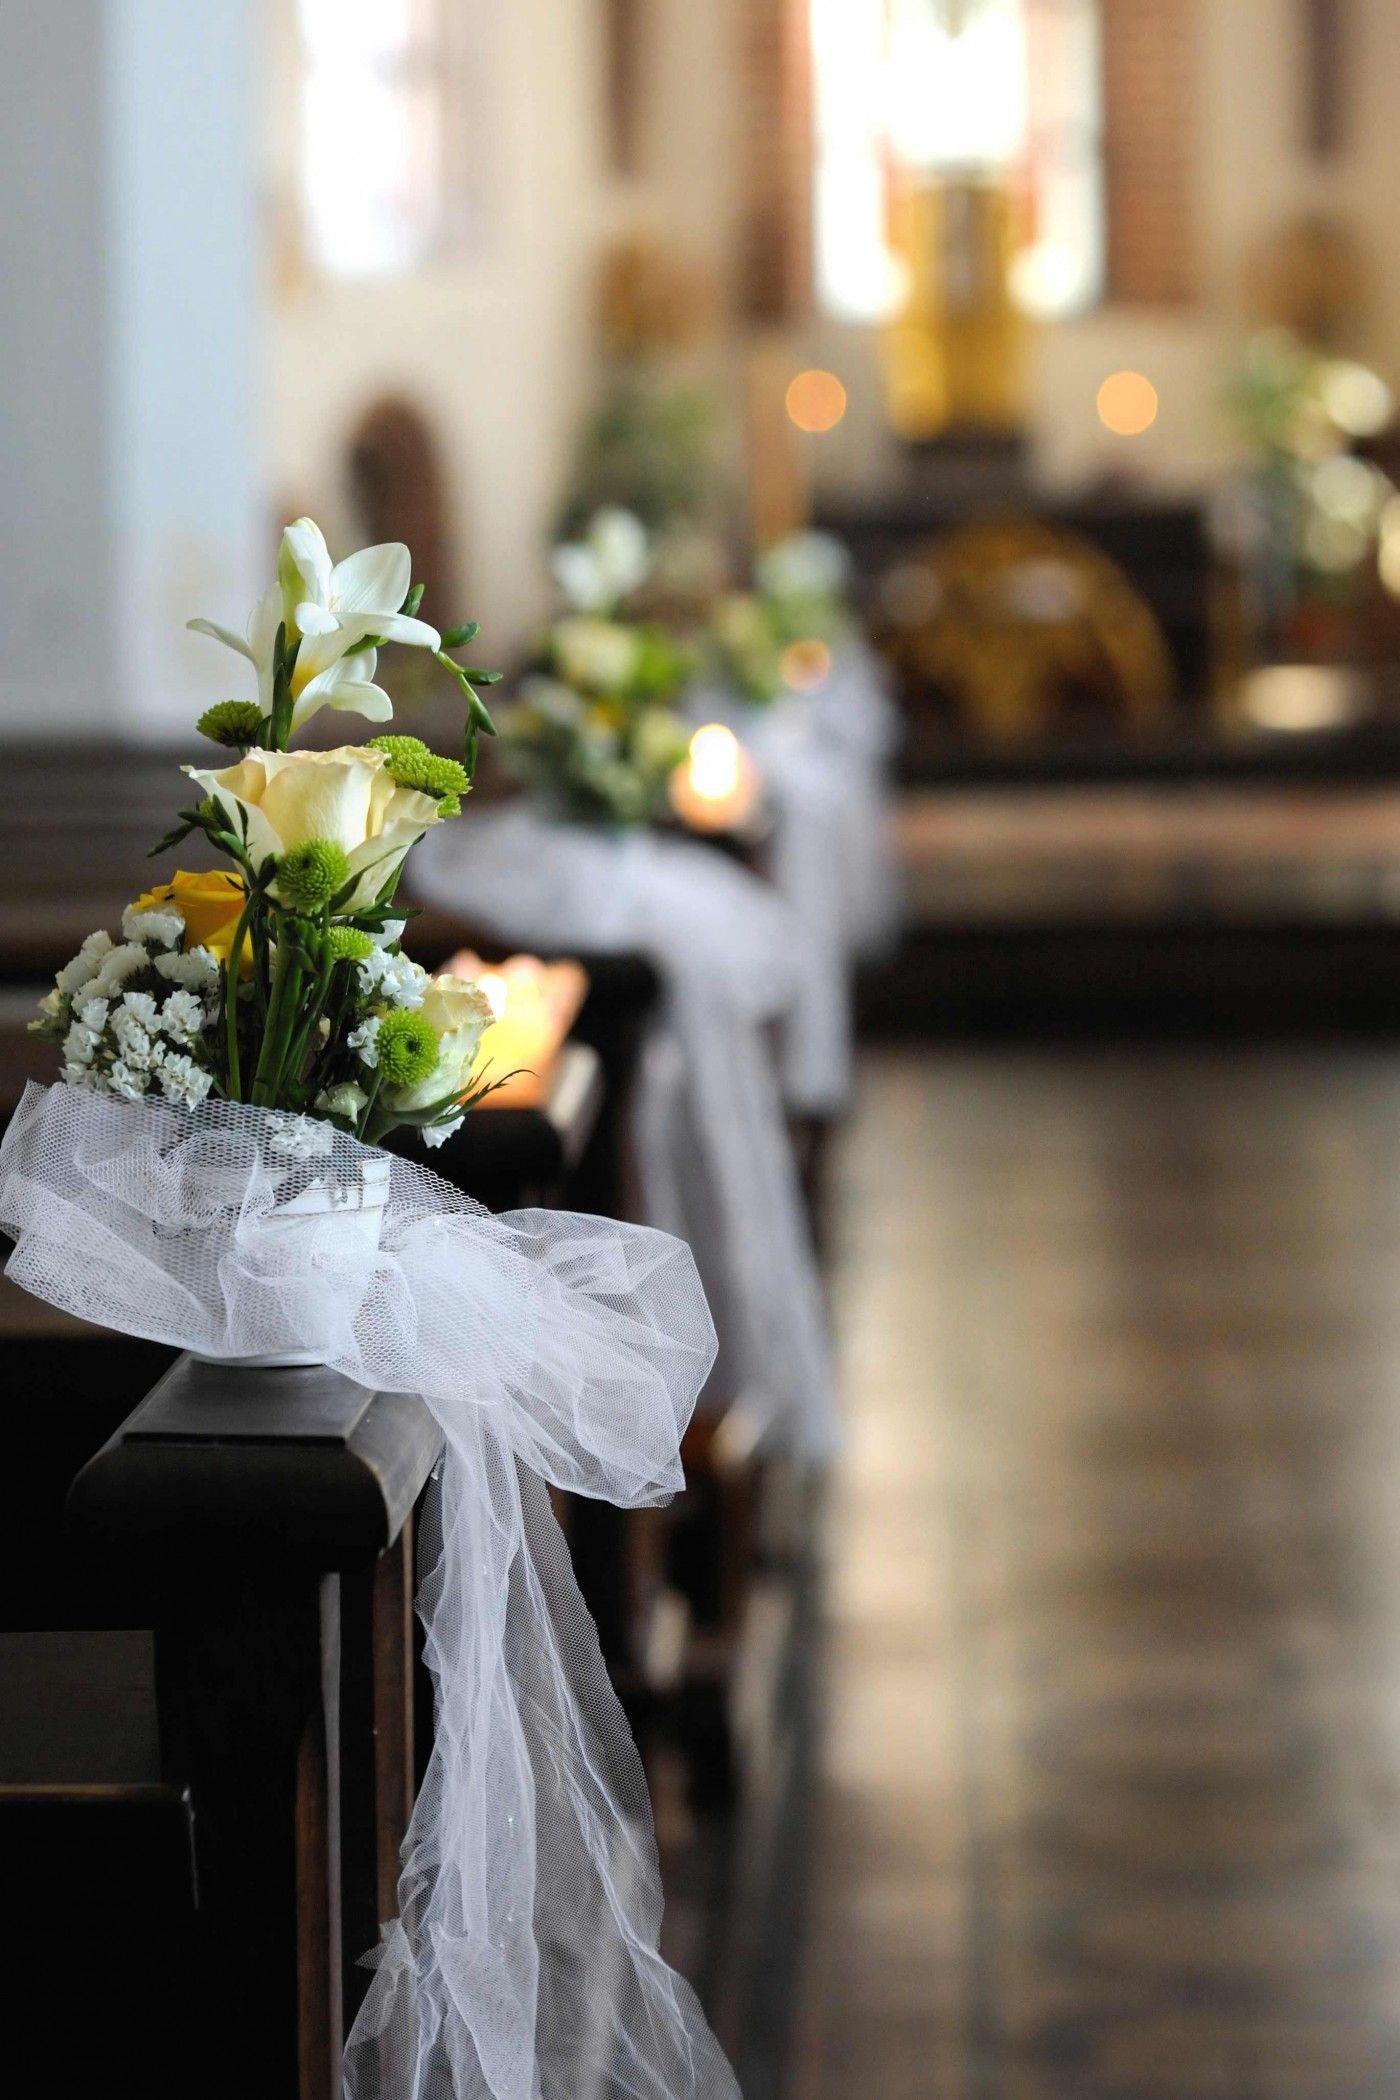 Hochzeit kirche deko